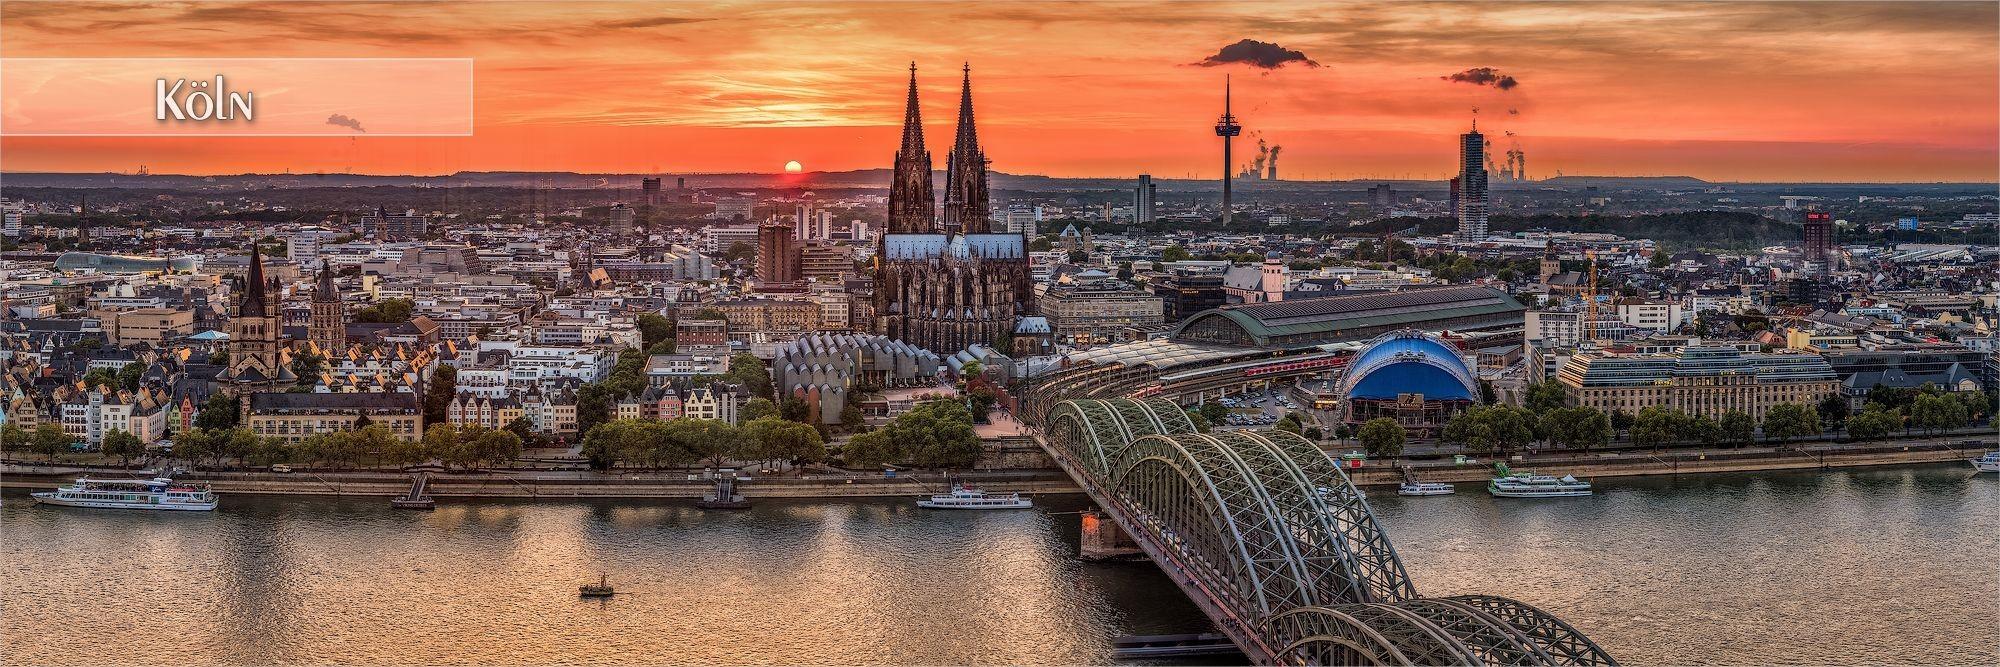 Kölner Bilder als Wandbild oder Küchenrückwand